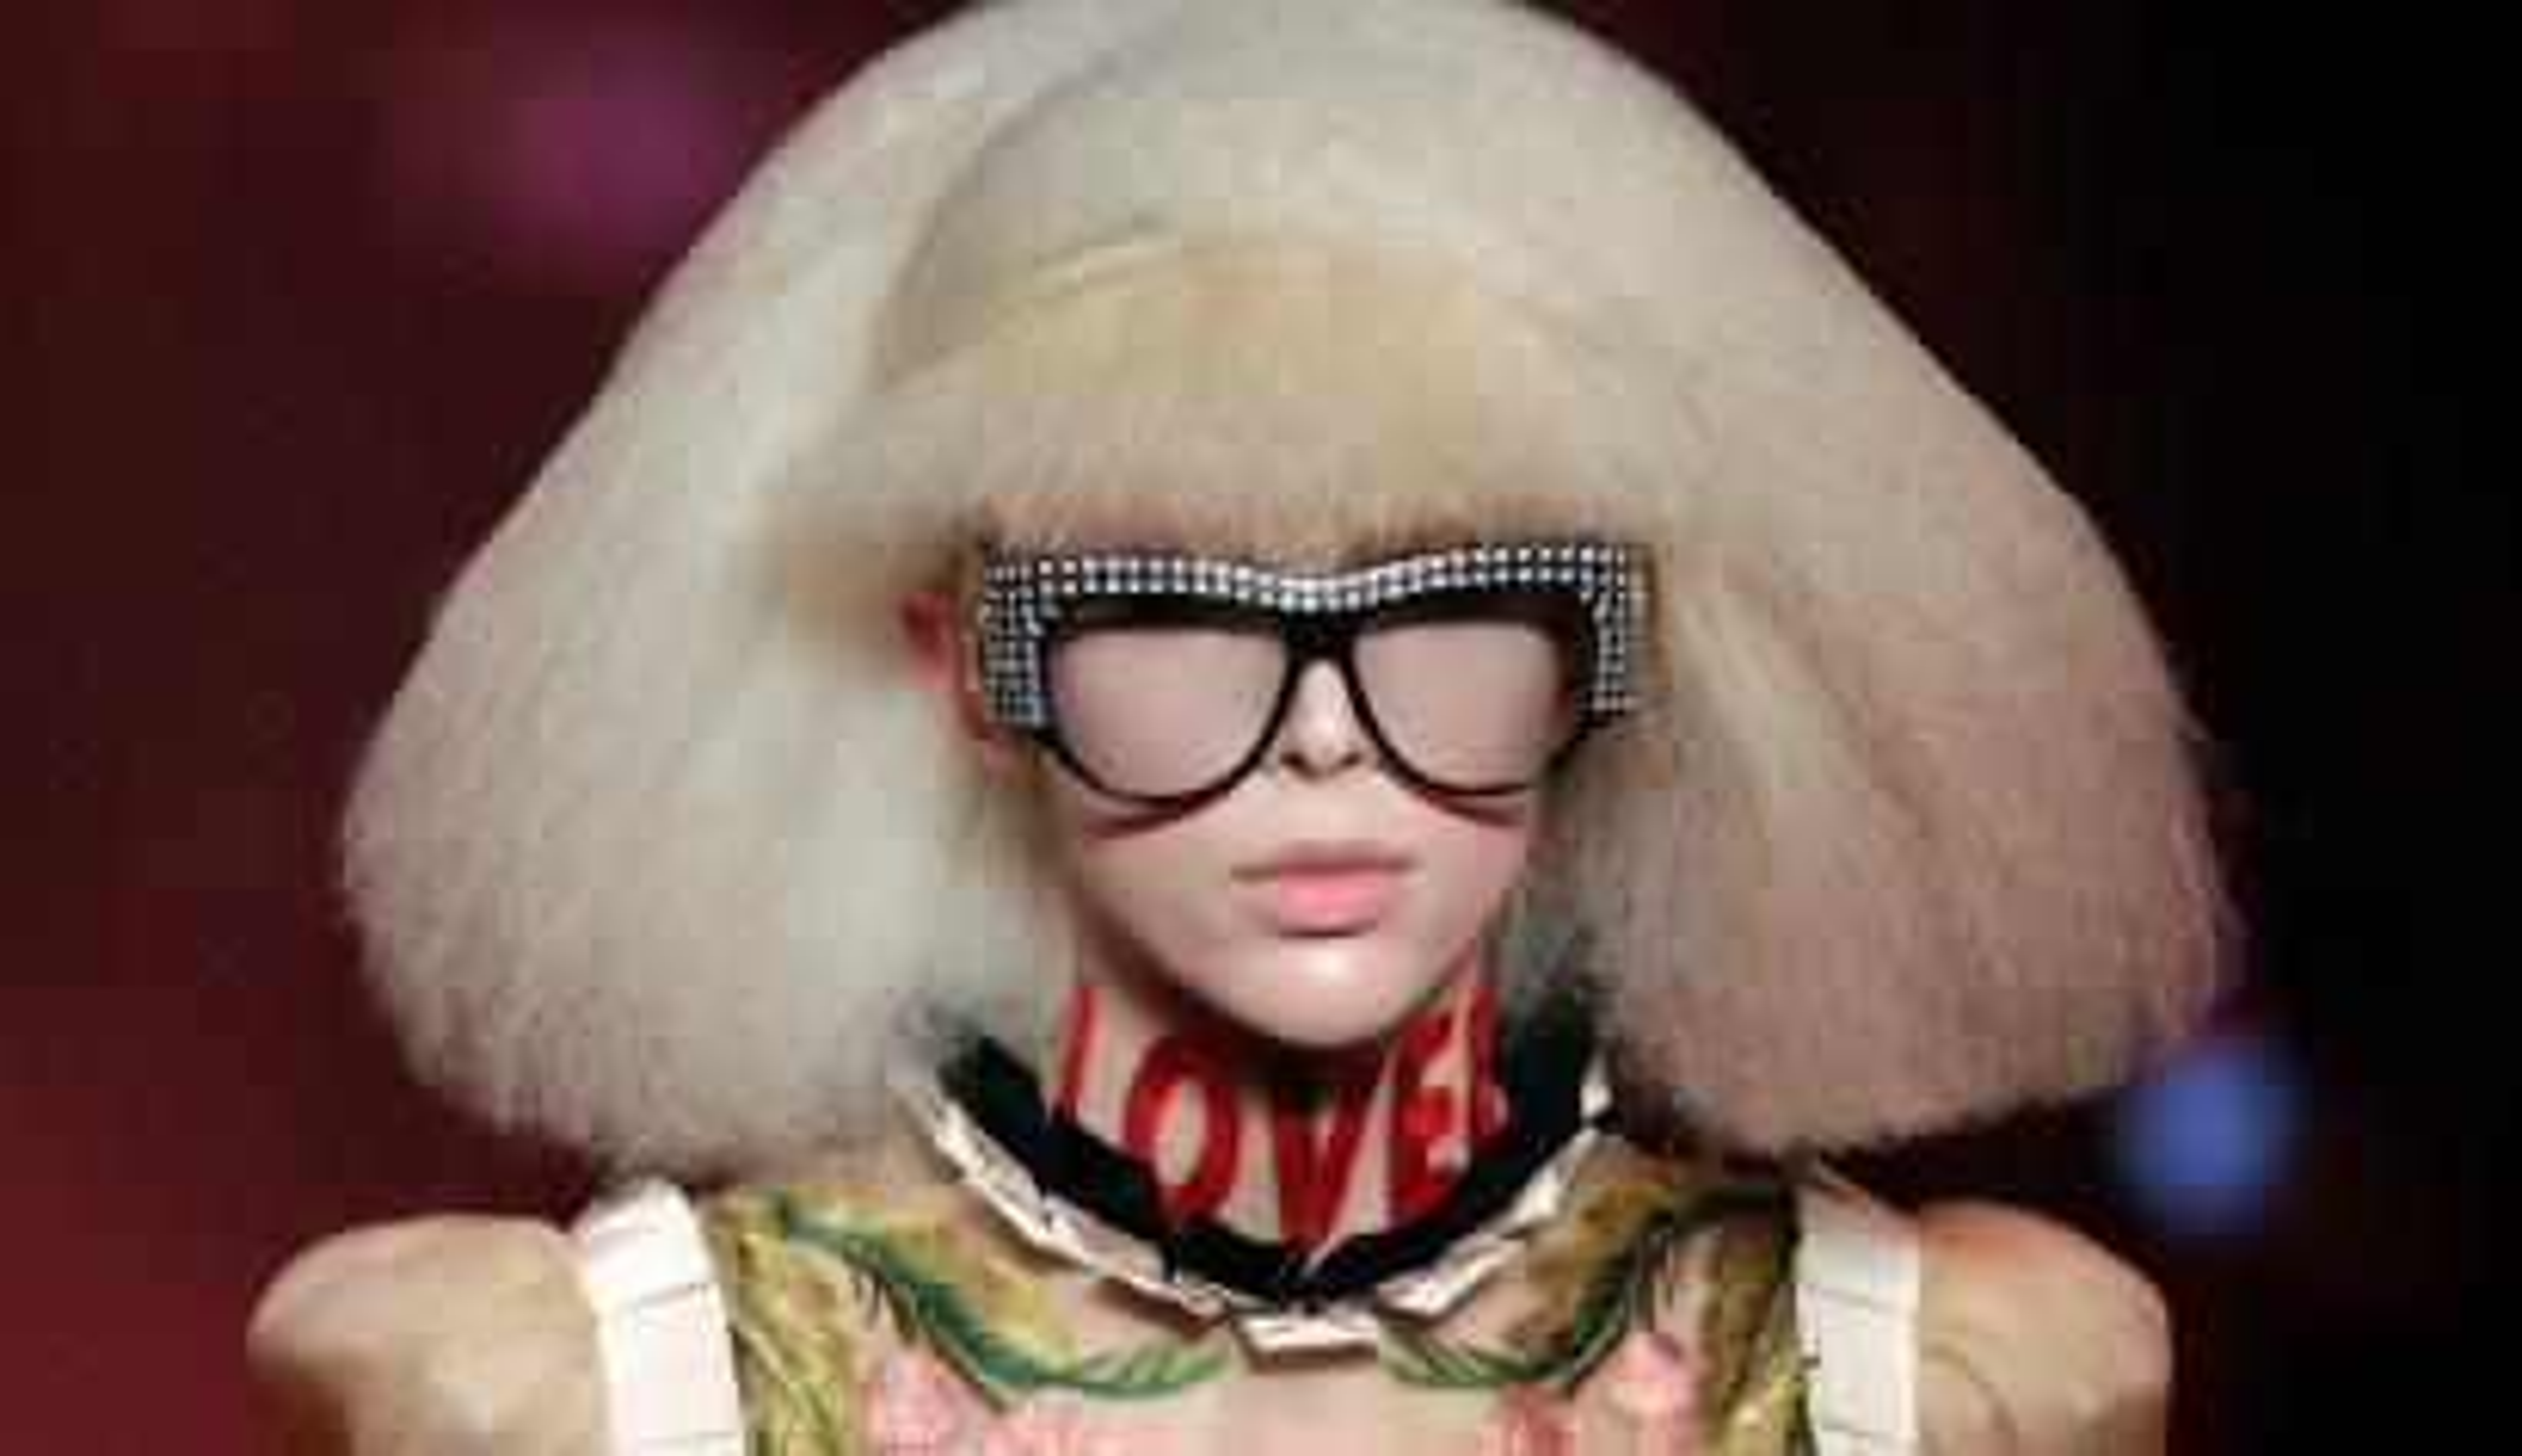 82fdd9b1e05 A model presents a creation at the Gucci fashion show during Milan Fashion  Week Spring